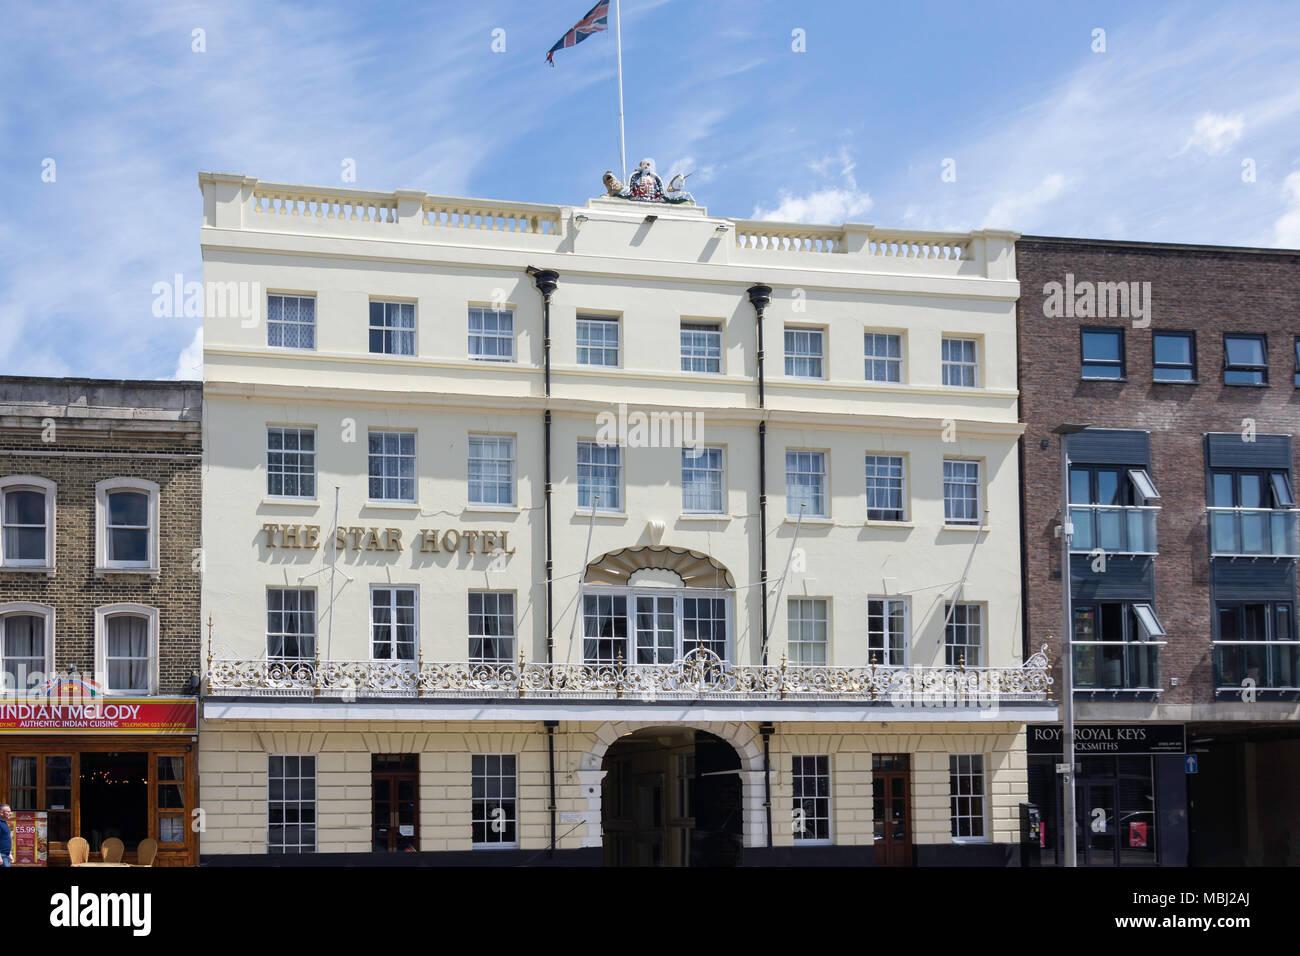 19th century The Star Hotel, High Street, Southampton, Hampshire, England, United Kingdom - Stock Image